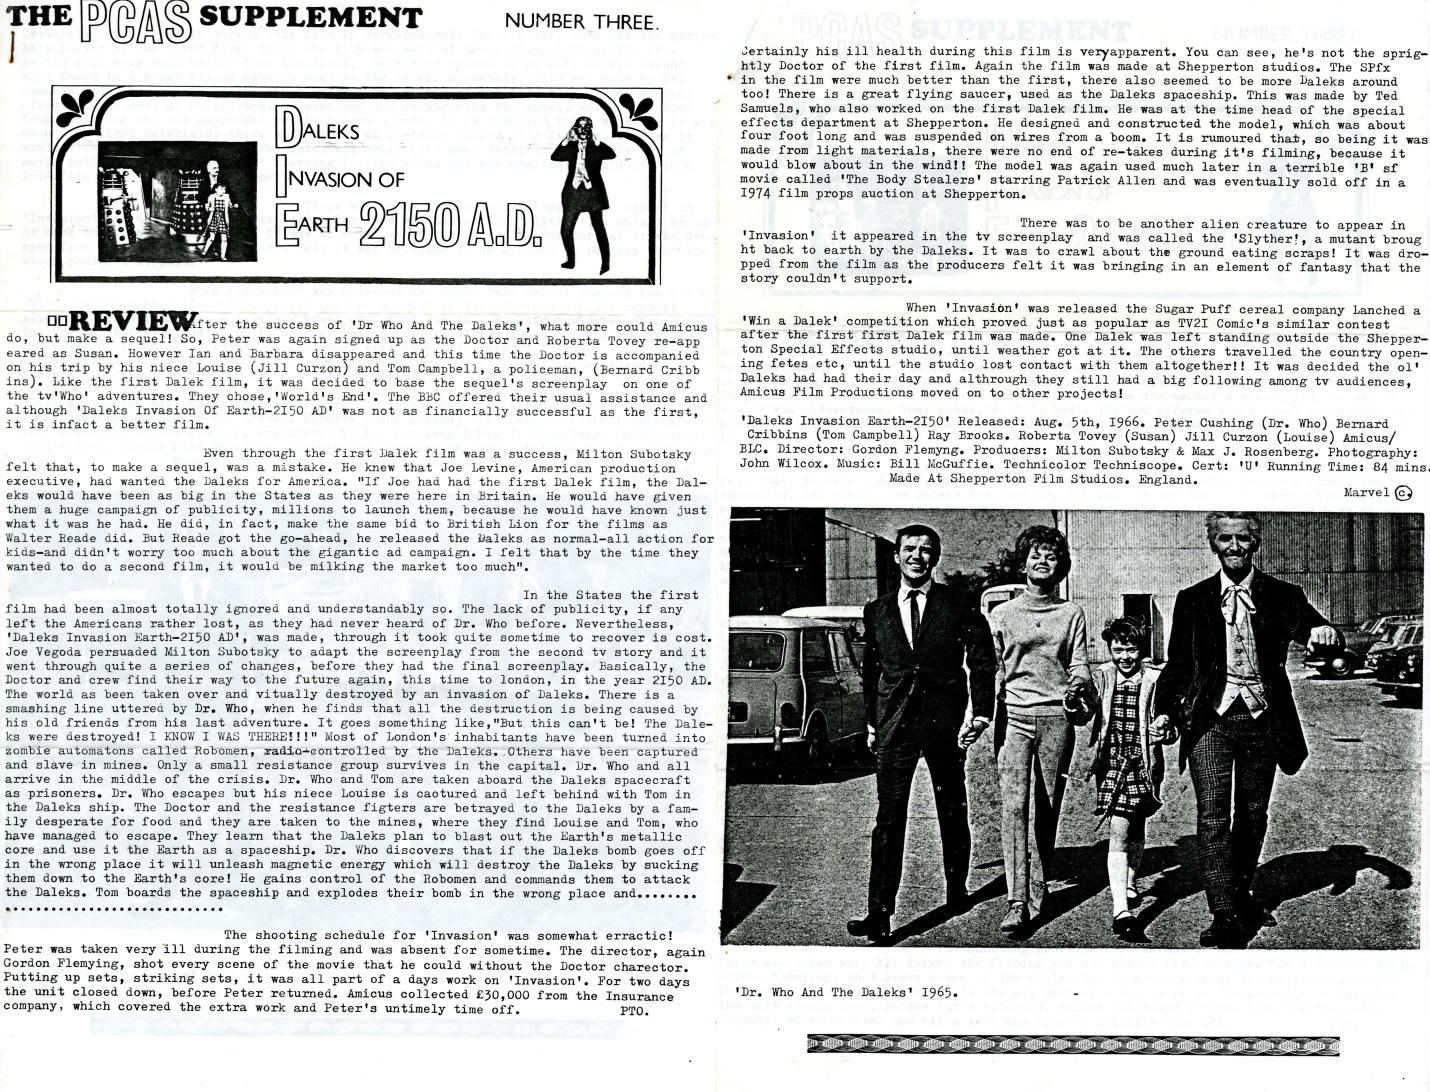 Peter Cushing Appreciation Society Supplement